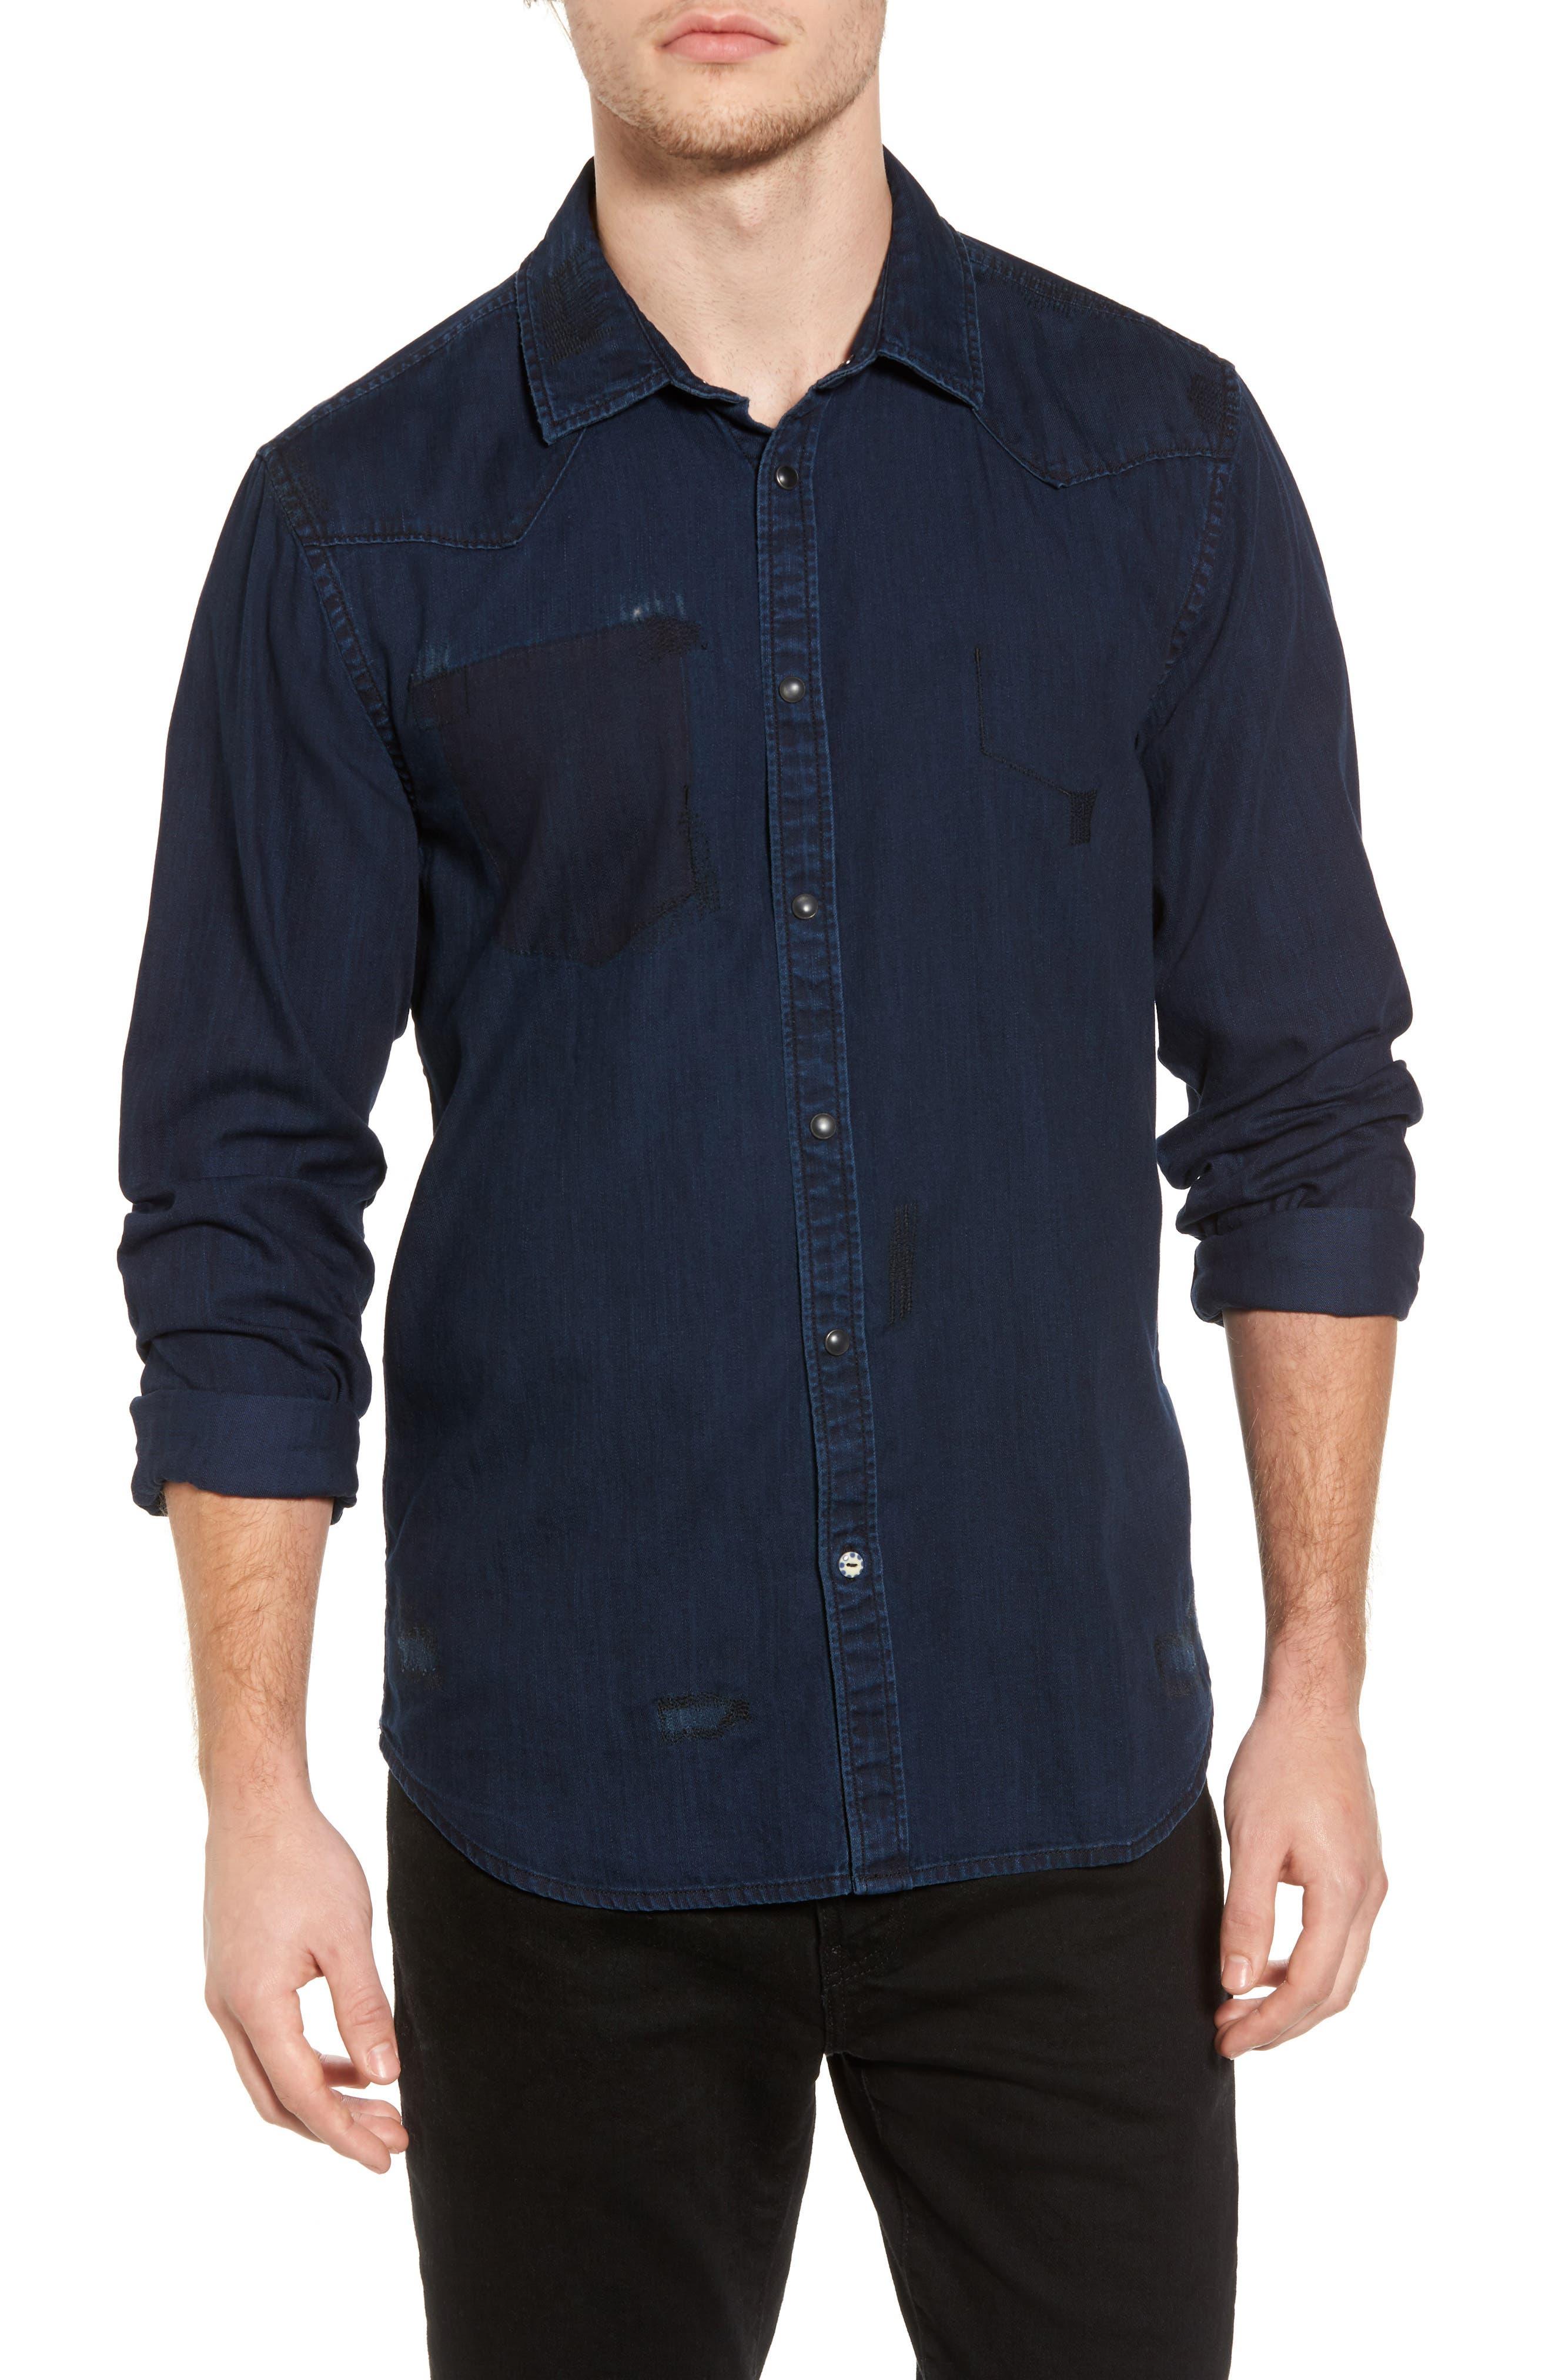 Pocketless Western Denim Shirt,                         Main,                         color, Midnight